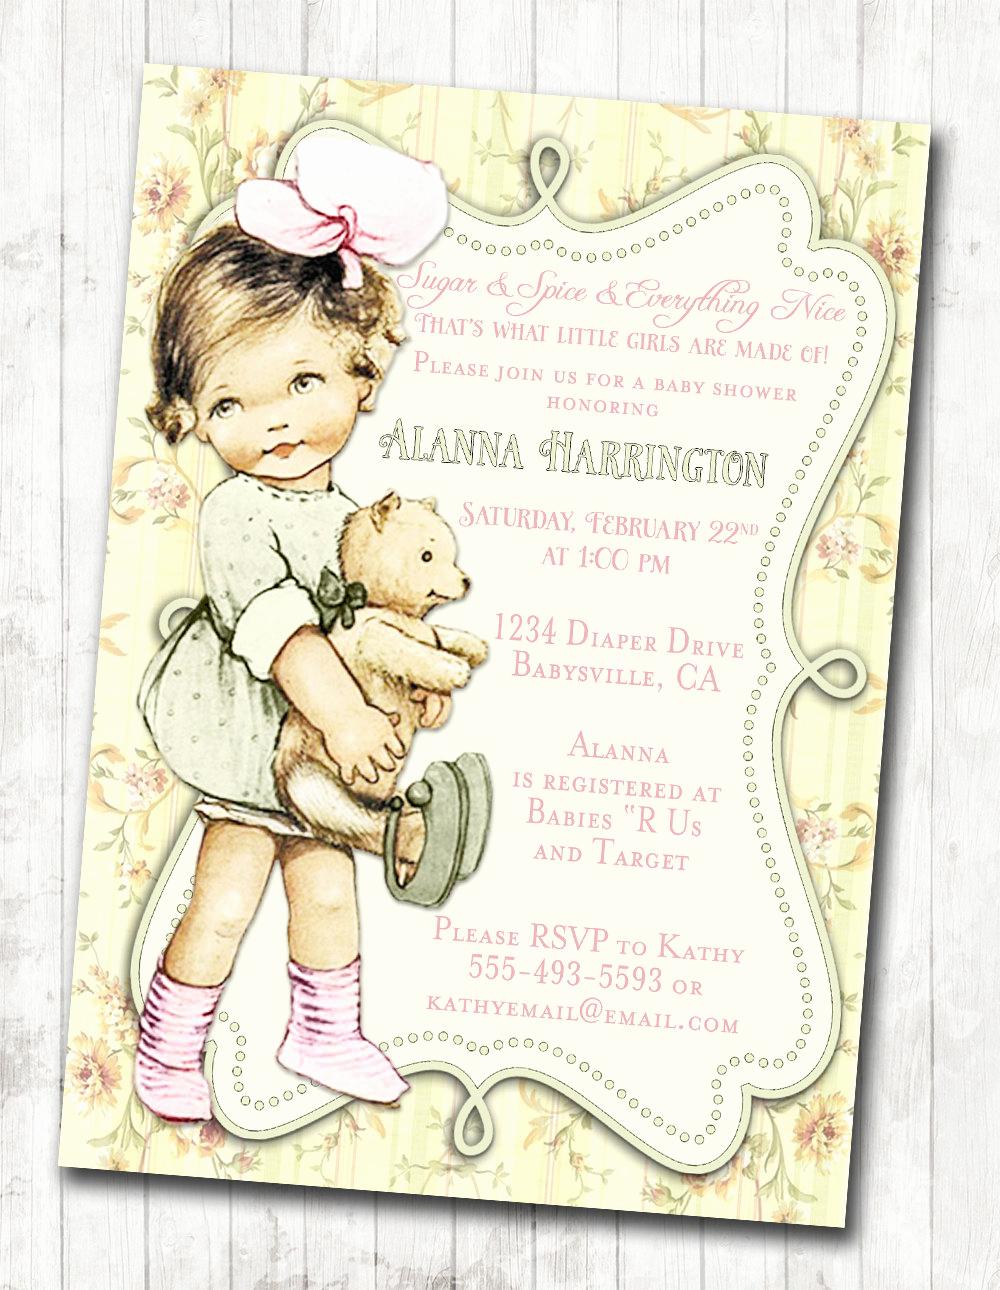 Vintage Baby Shower Invitation Inspirational Shabby Chic Floral Vintage Baby Shower Invitation for Girl